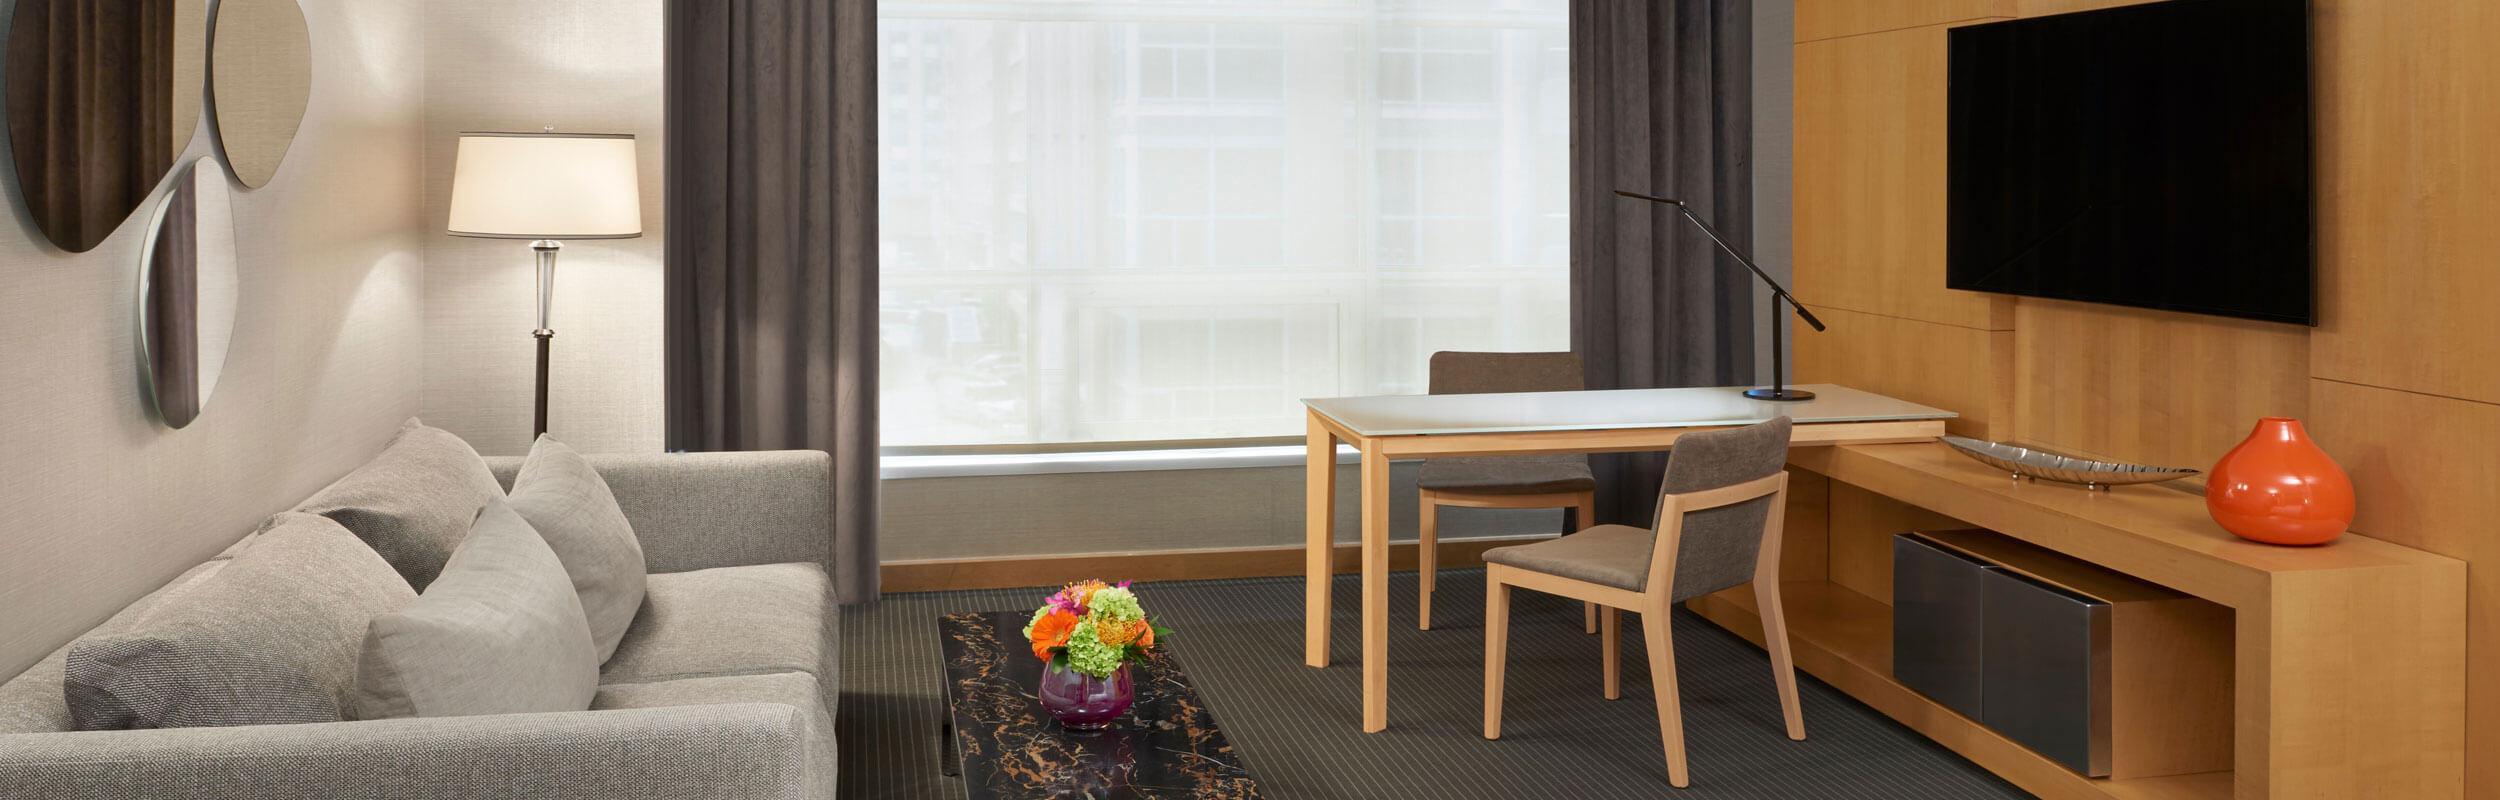 SoHo Hotel renovated premier luxury room